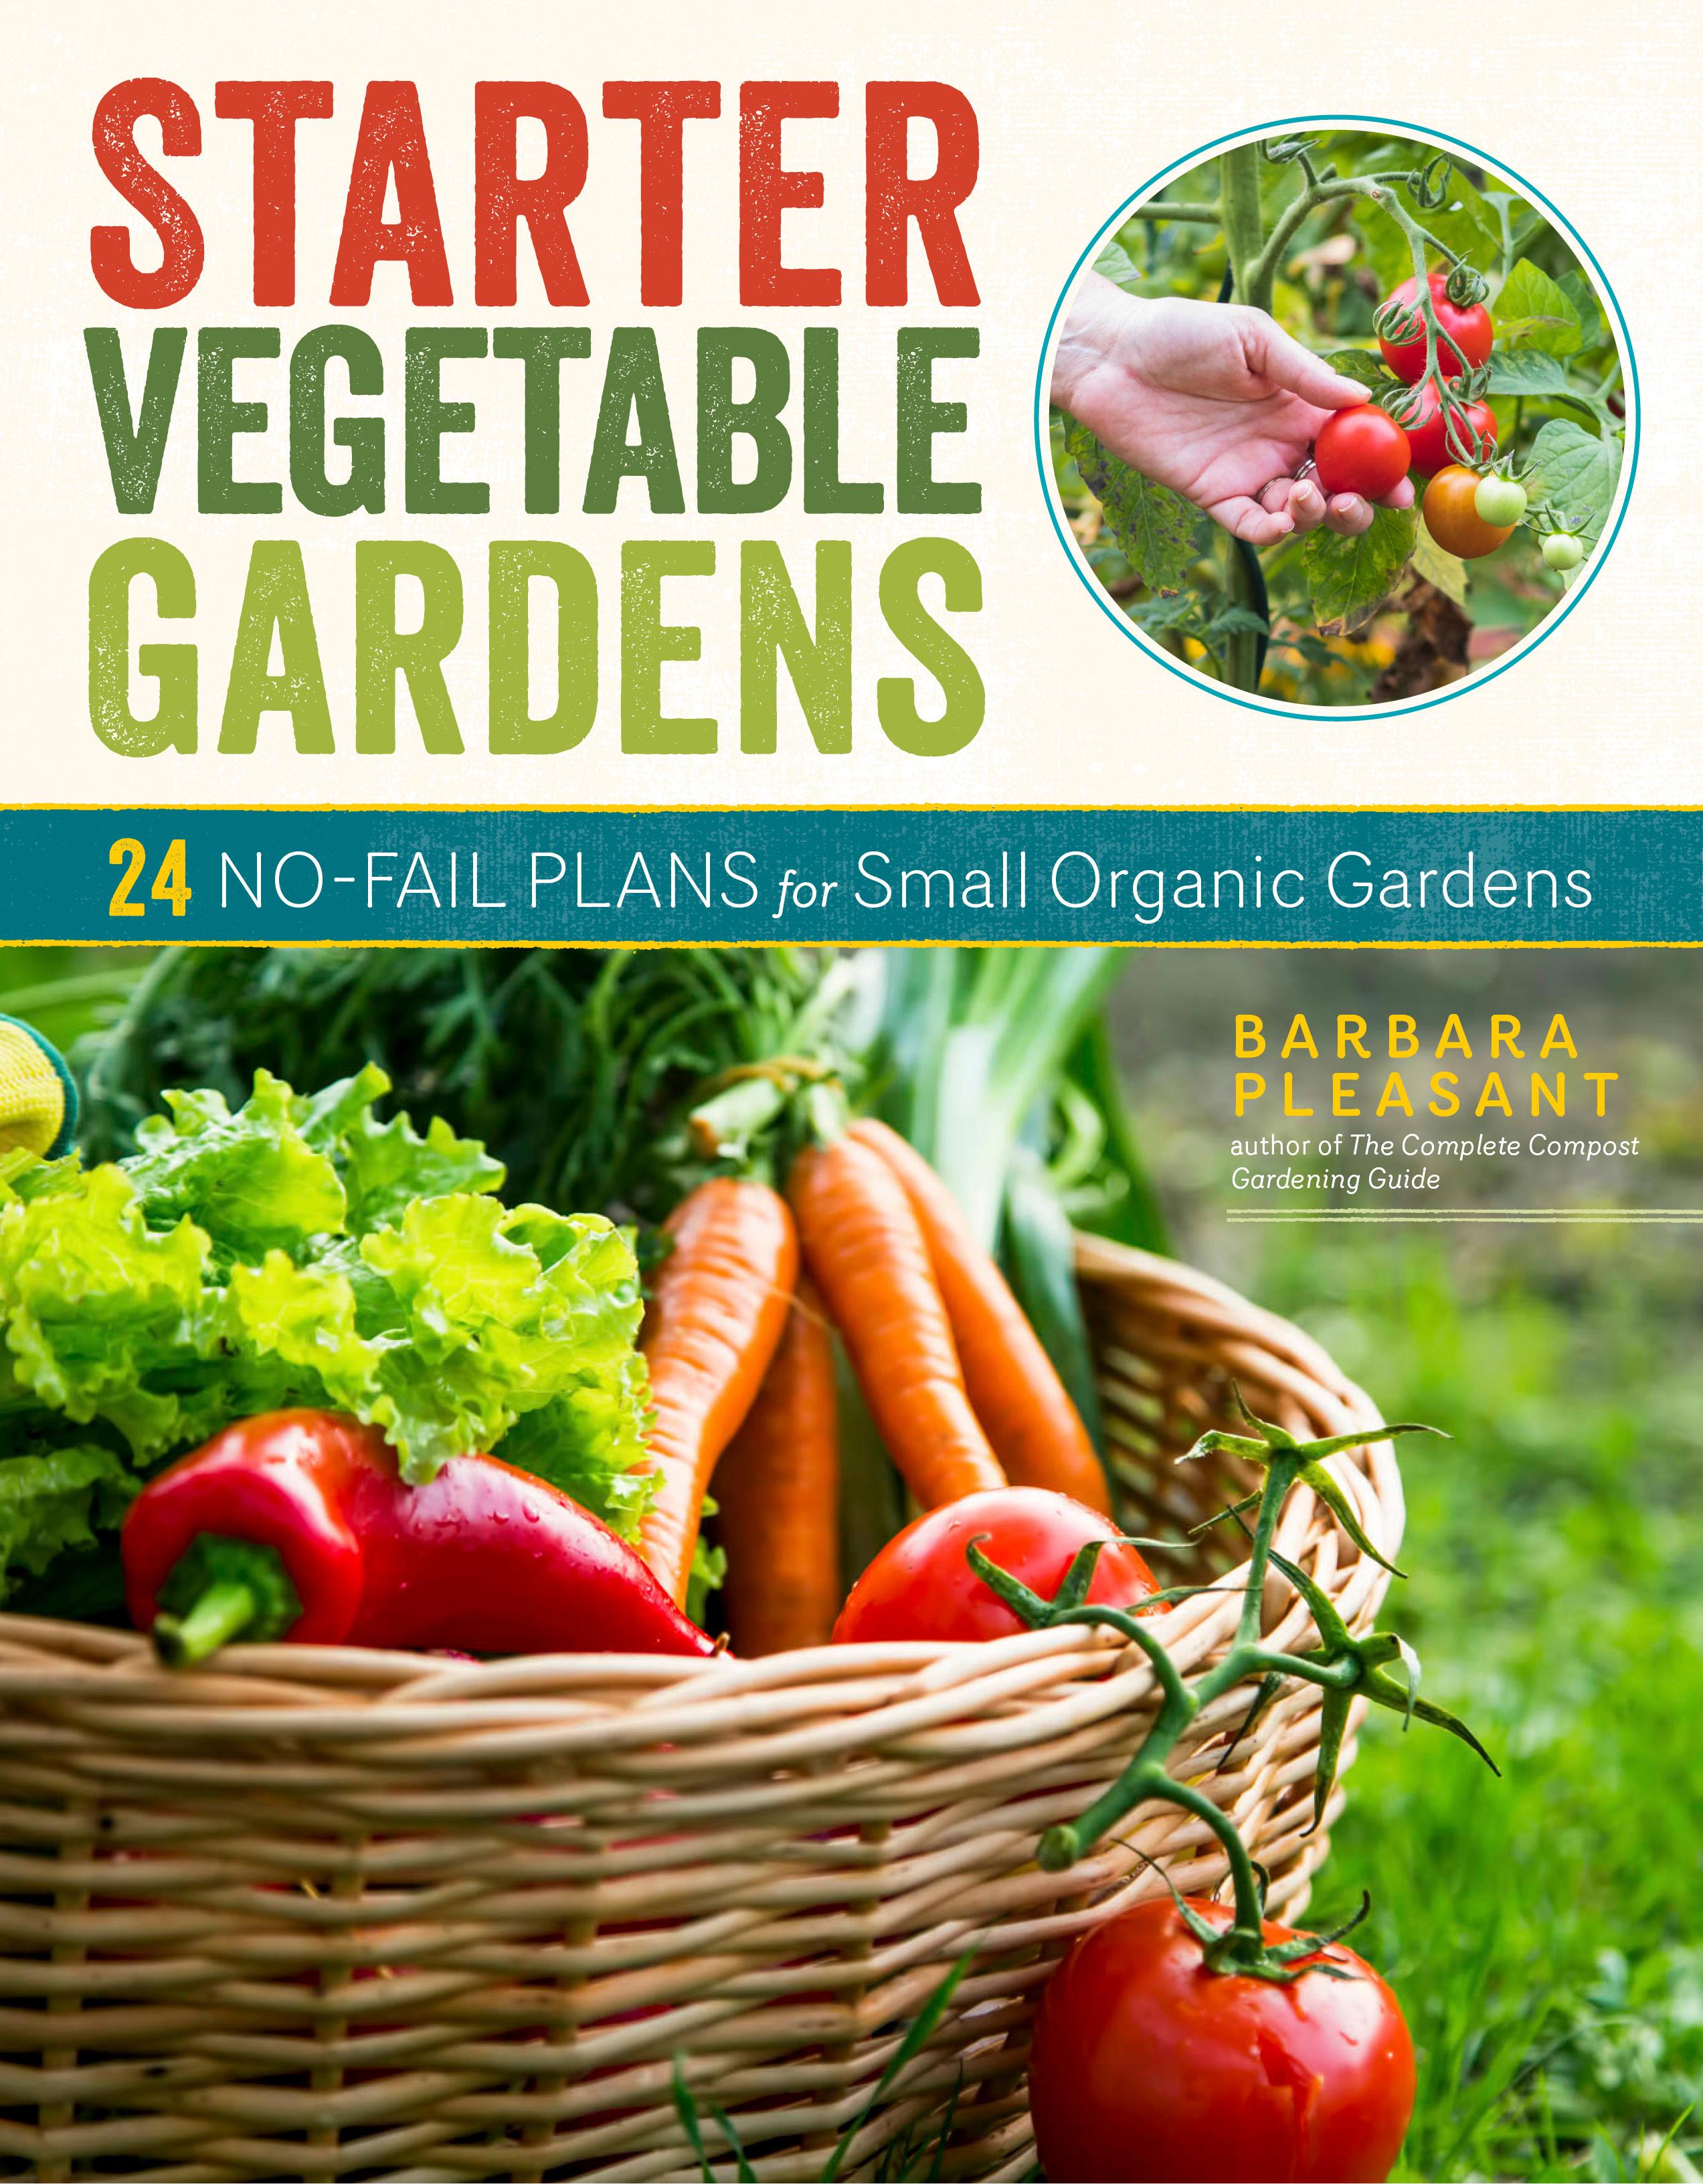 Starter Vegetable Gardens, 2nd Edition 24 No-Fail Plans for Small Organic Gardens - Barbara Pleasant